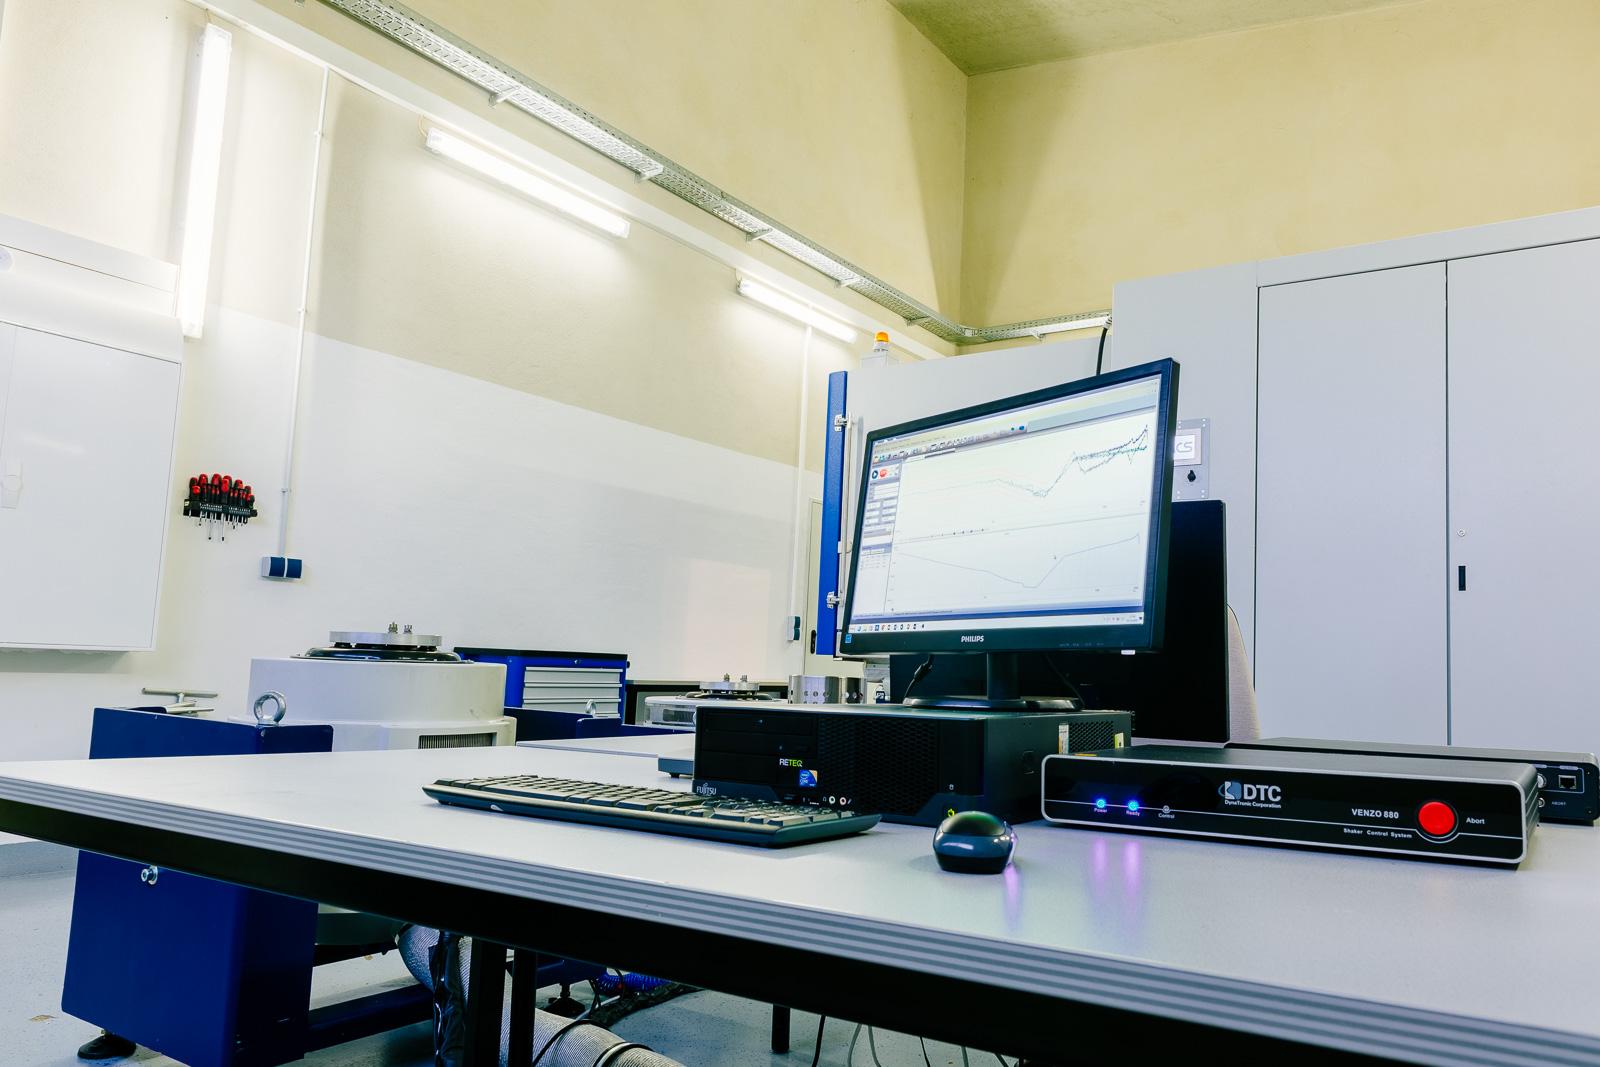 DTC Venzo 880 Vibrations Controller